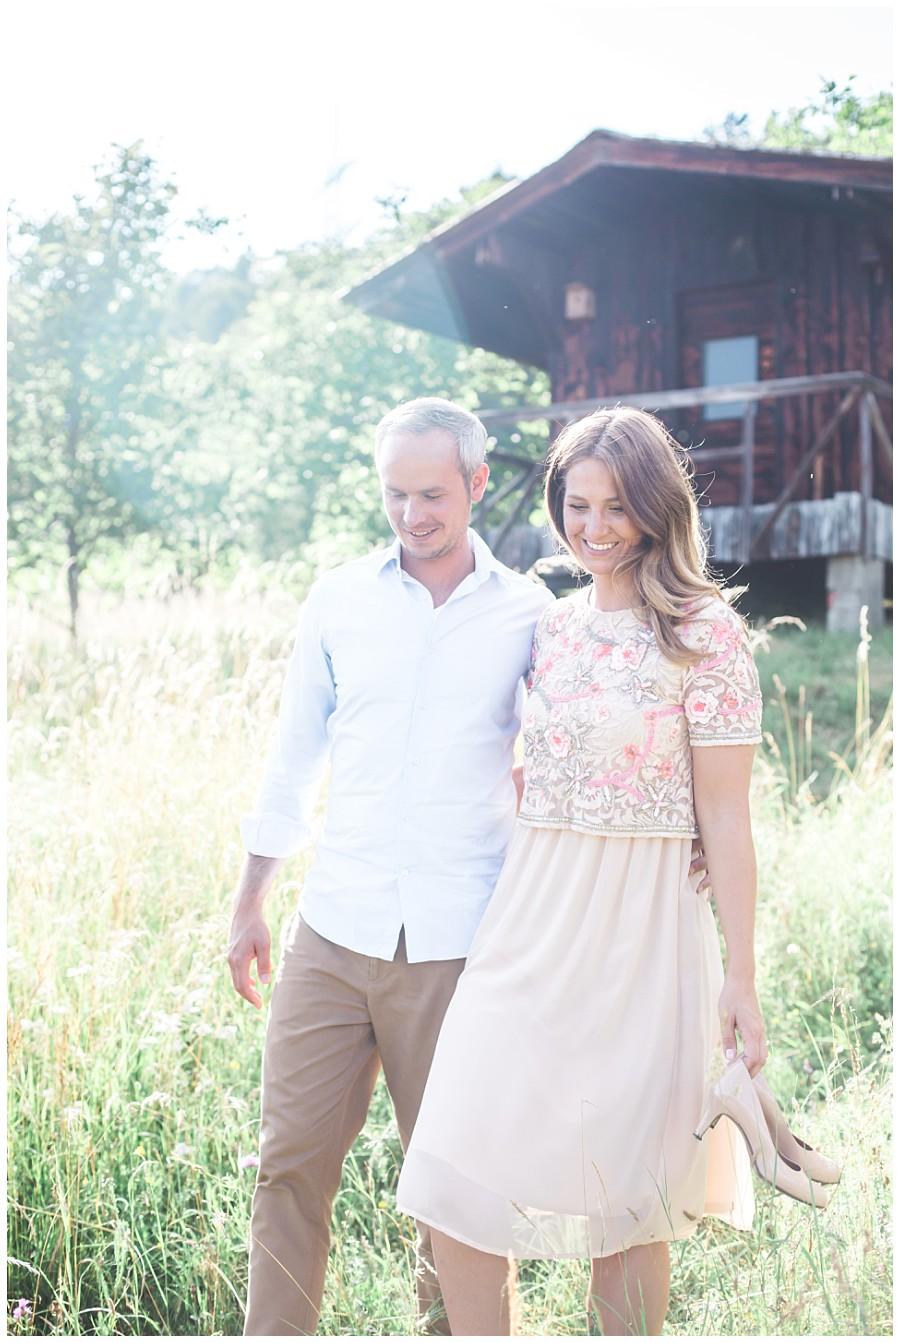 Engagement-Shooting-Nuernberg-Bamberg_Hochzeitsbilder-by-Claudia-Pelny_0014